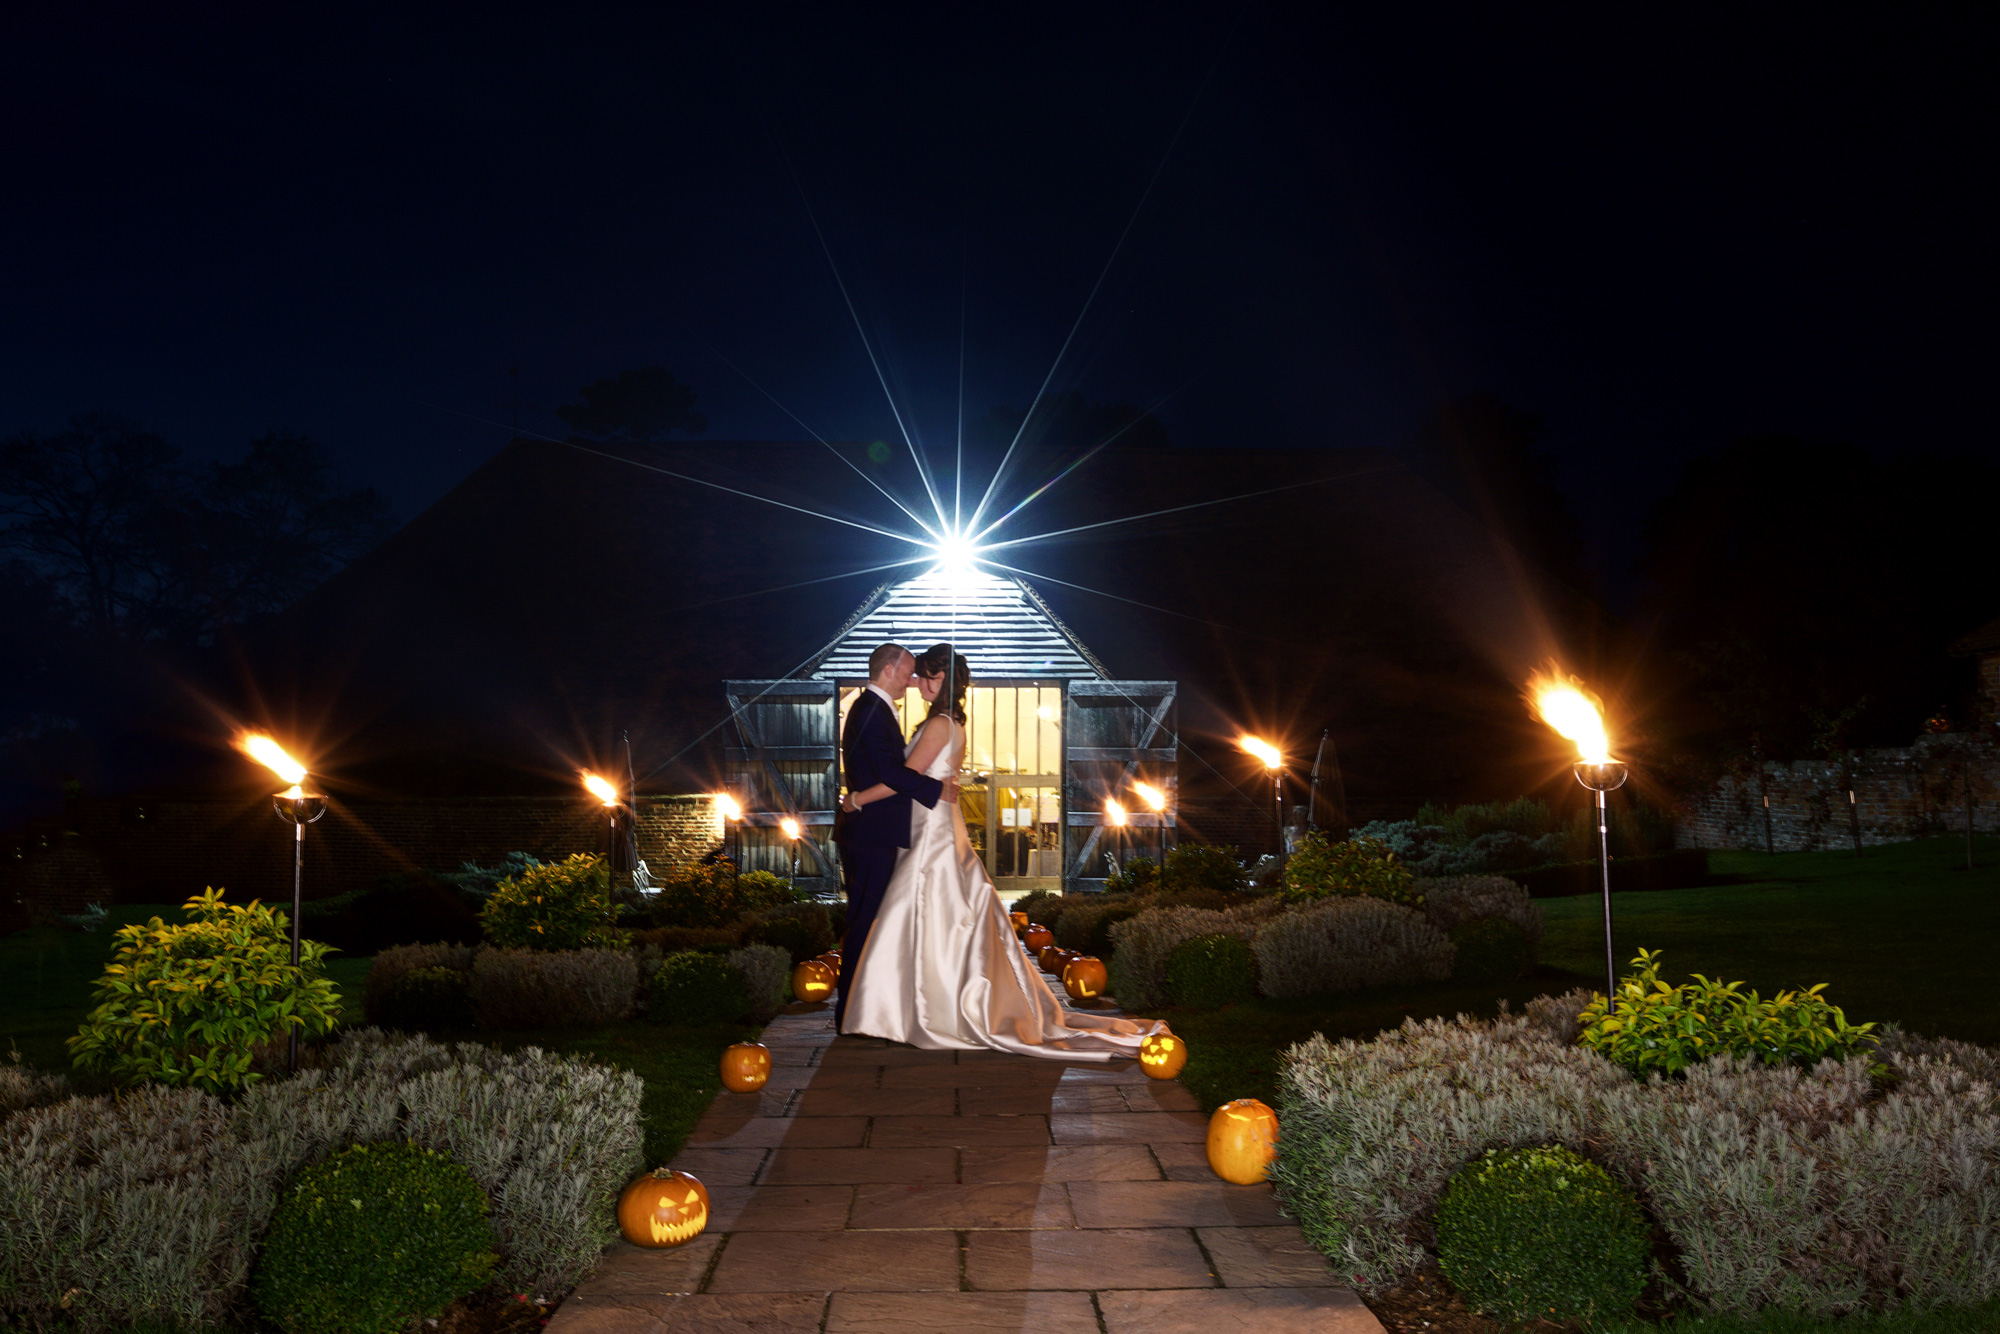 Adam_Hillier_Wedding_Photographer_Newbury_Berkshire_4 (7).jpg